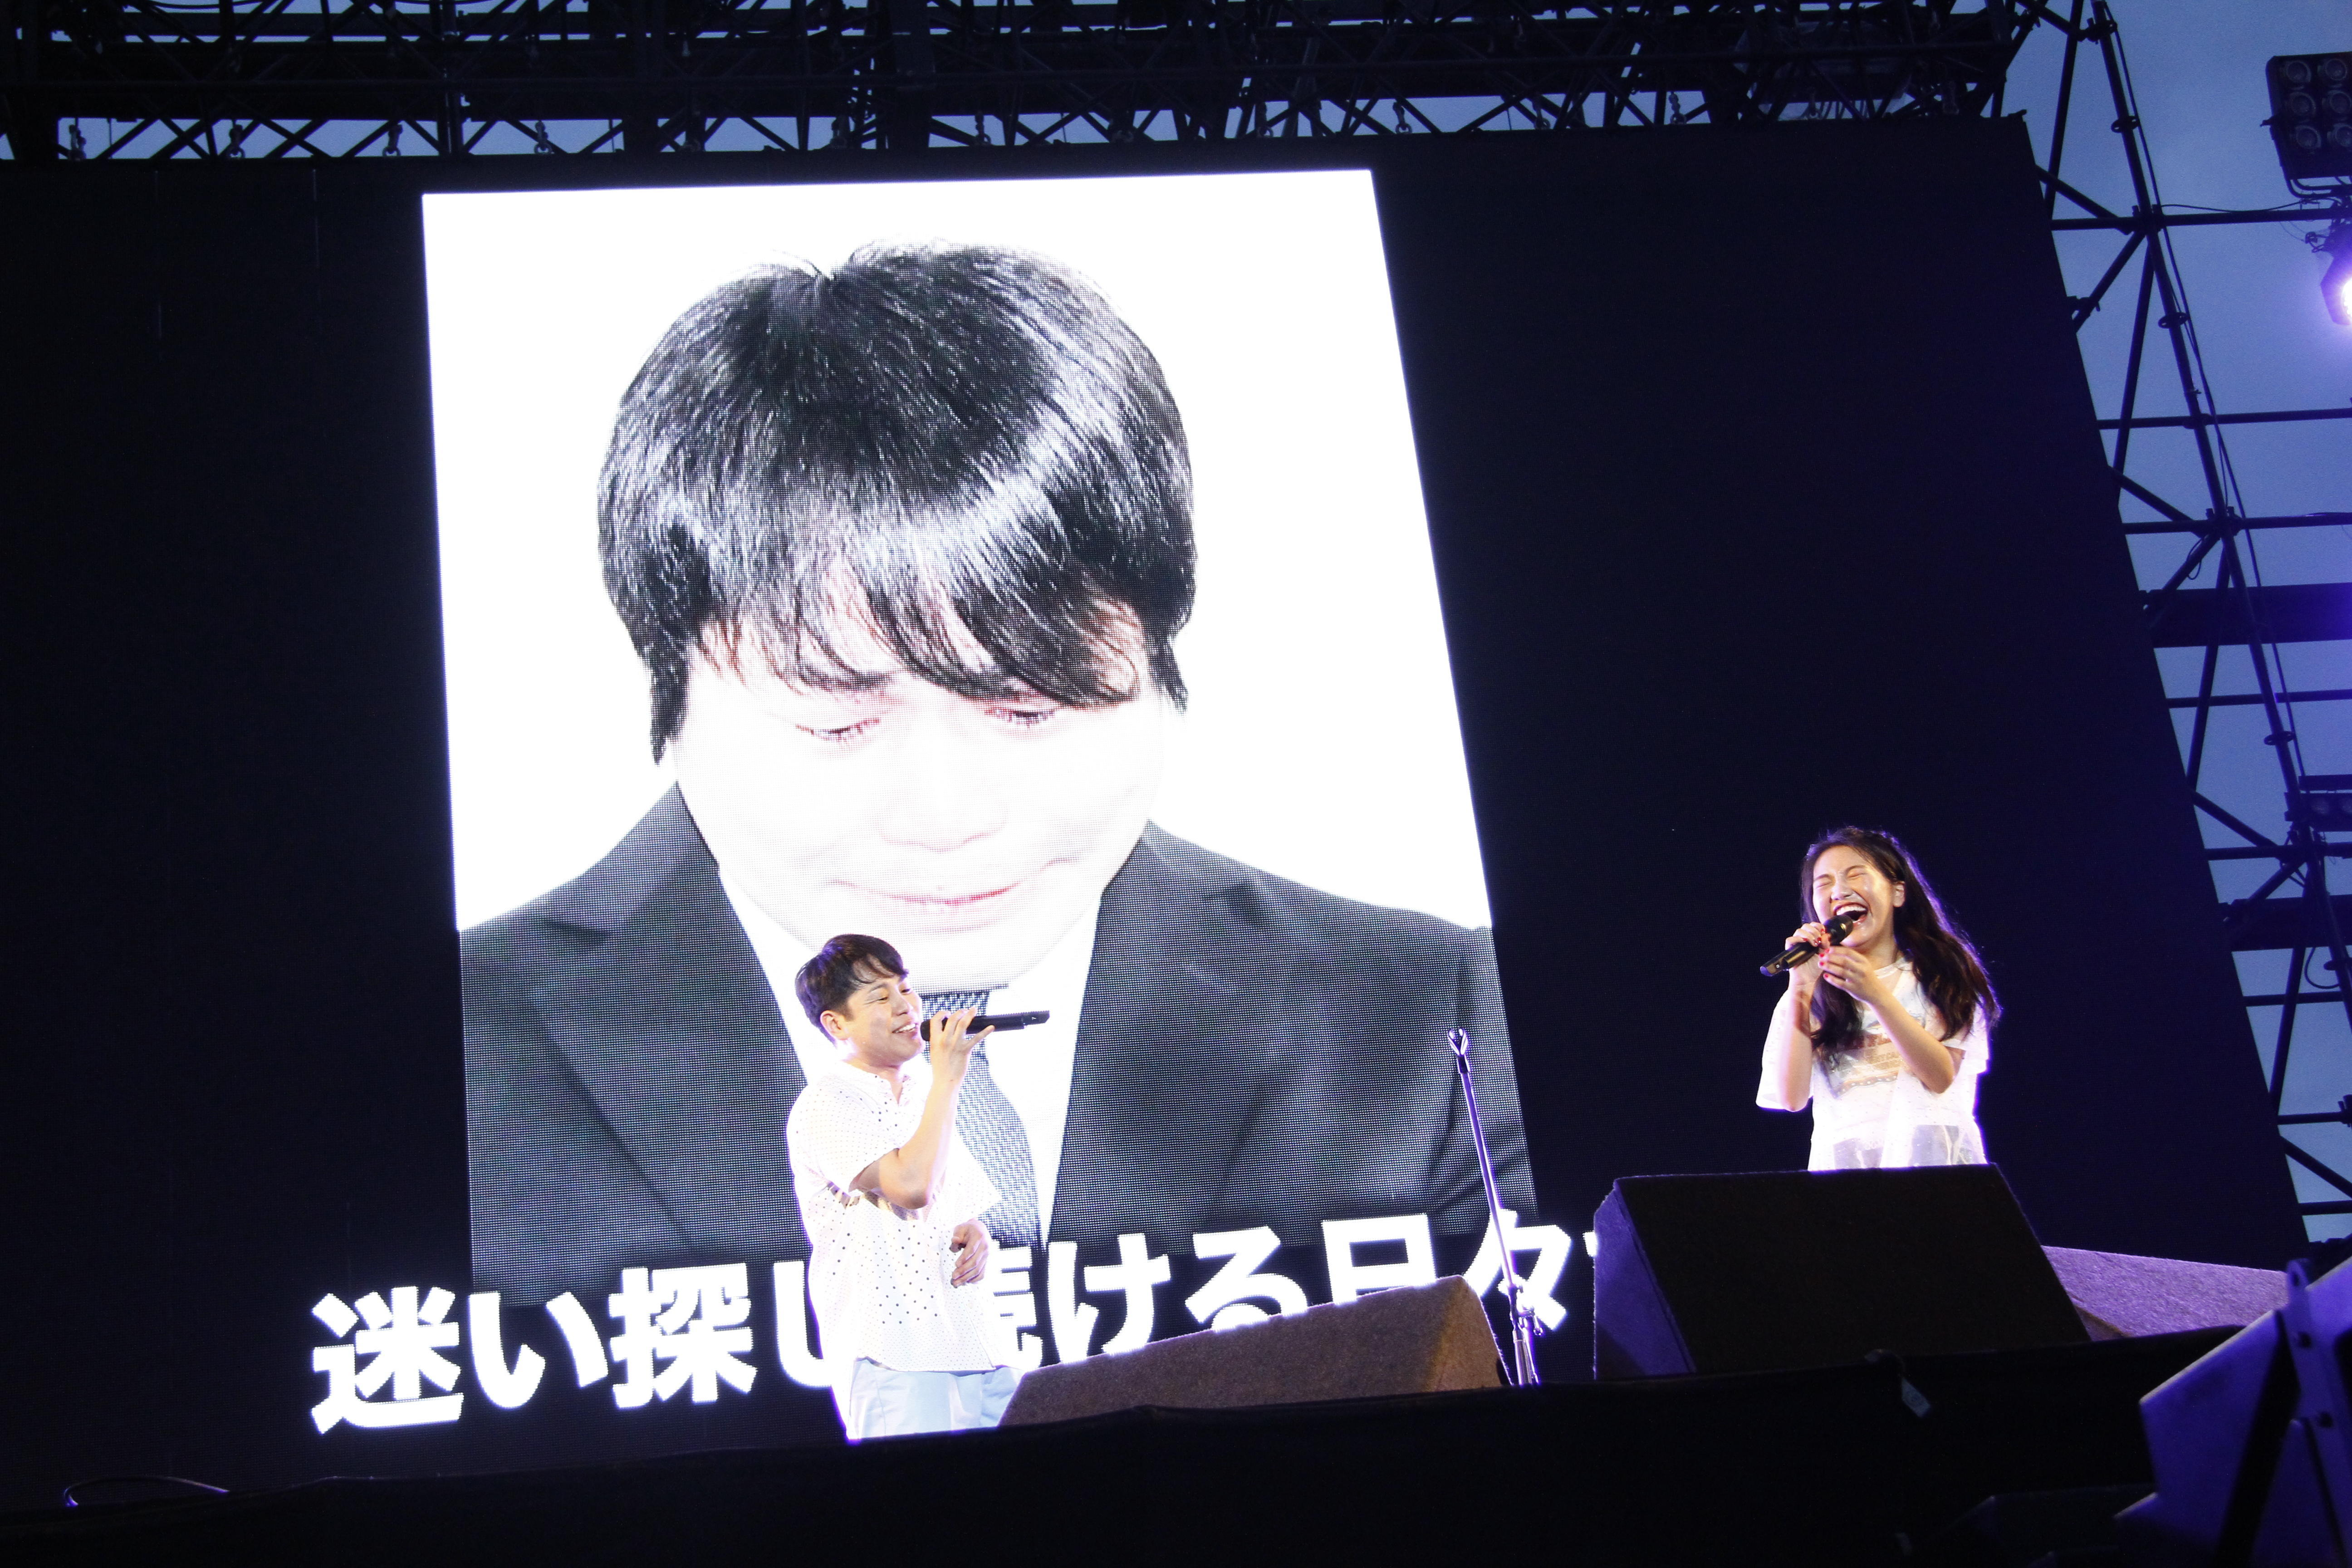 http://news.yoshimoto.co.jp/20170807021552-5e79398d510eabfc43f9fb989ec0ef66308feed5.jpg